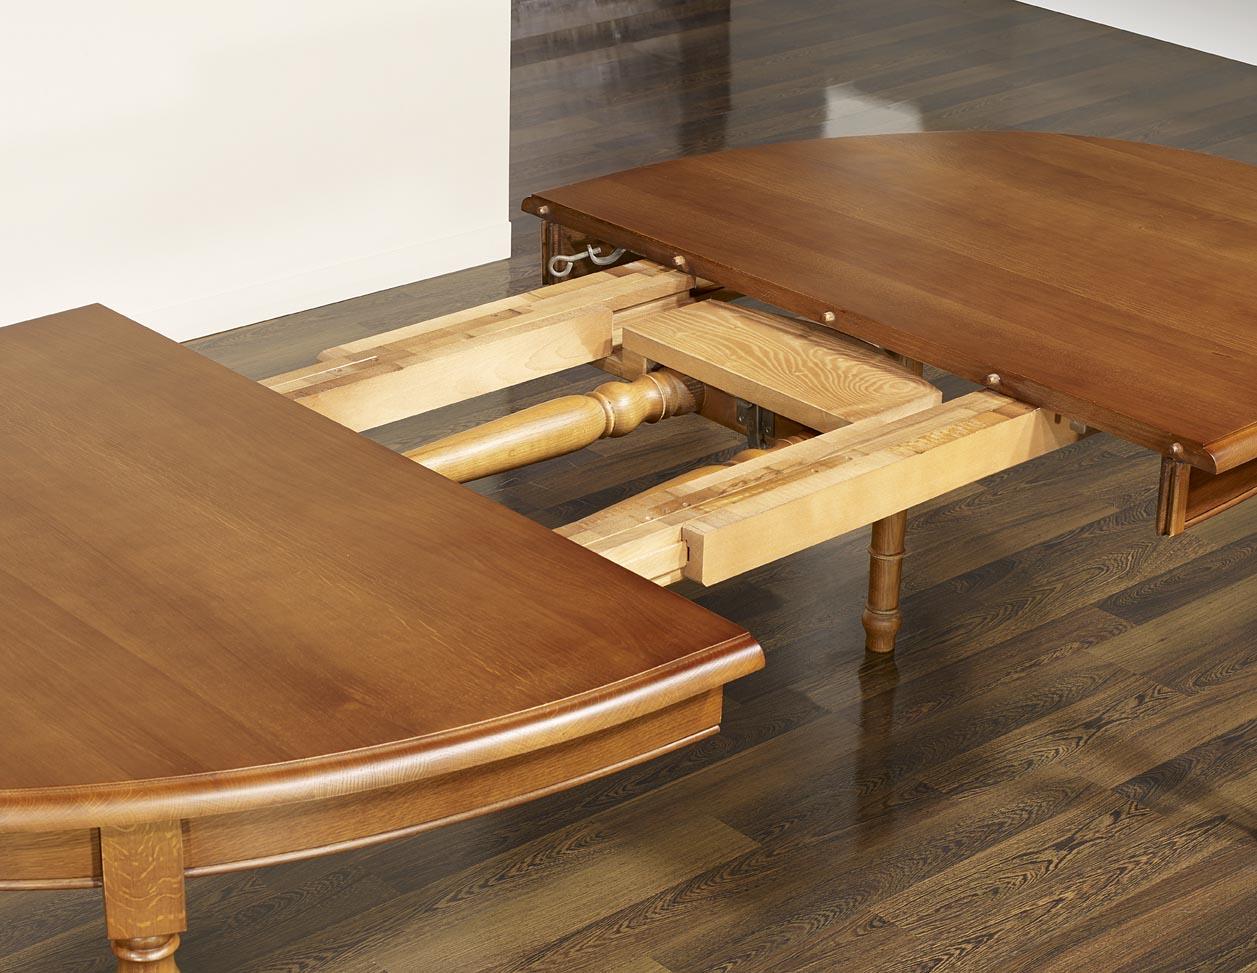 Table Ovale 170x110 En Chene Massif De Style Louis Philippe Avec 4